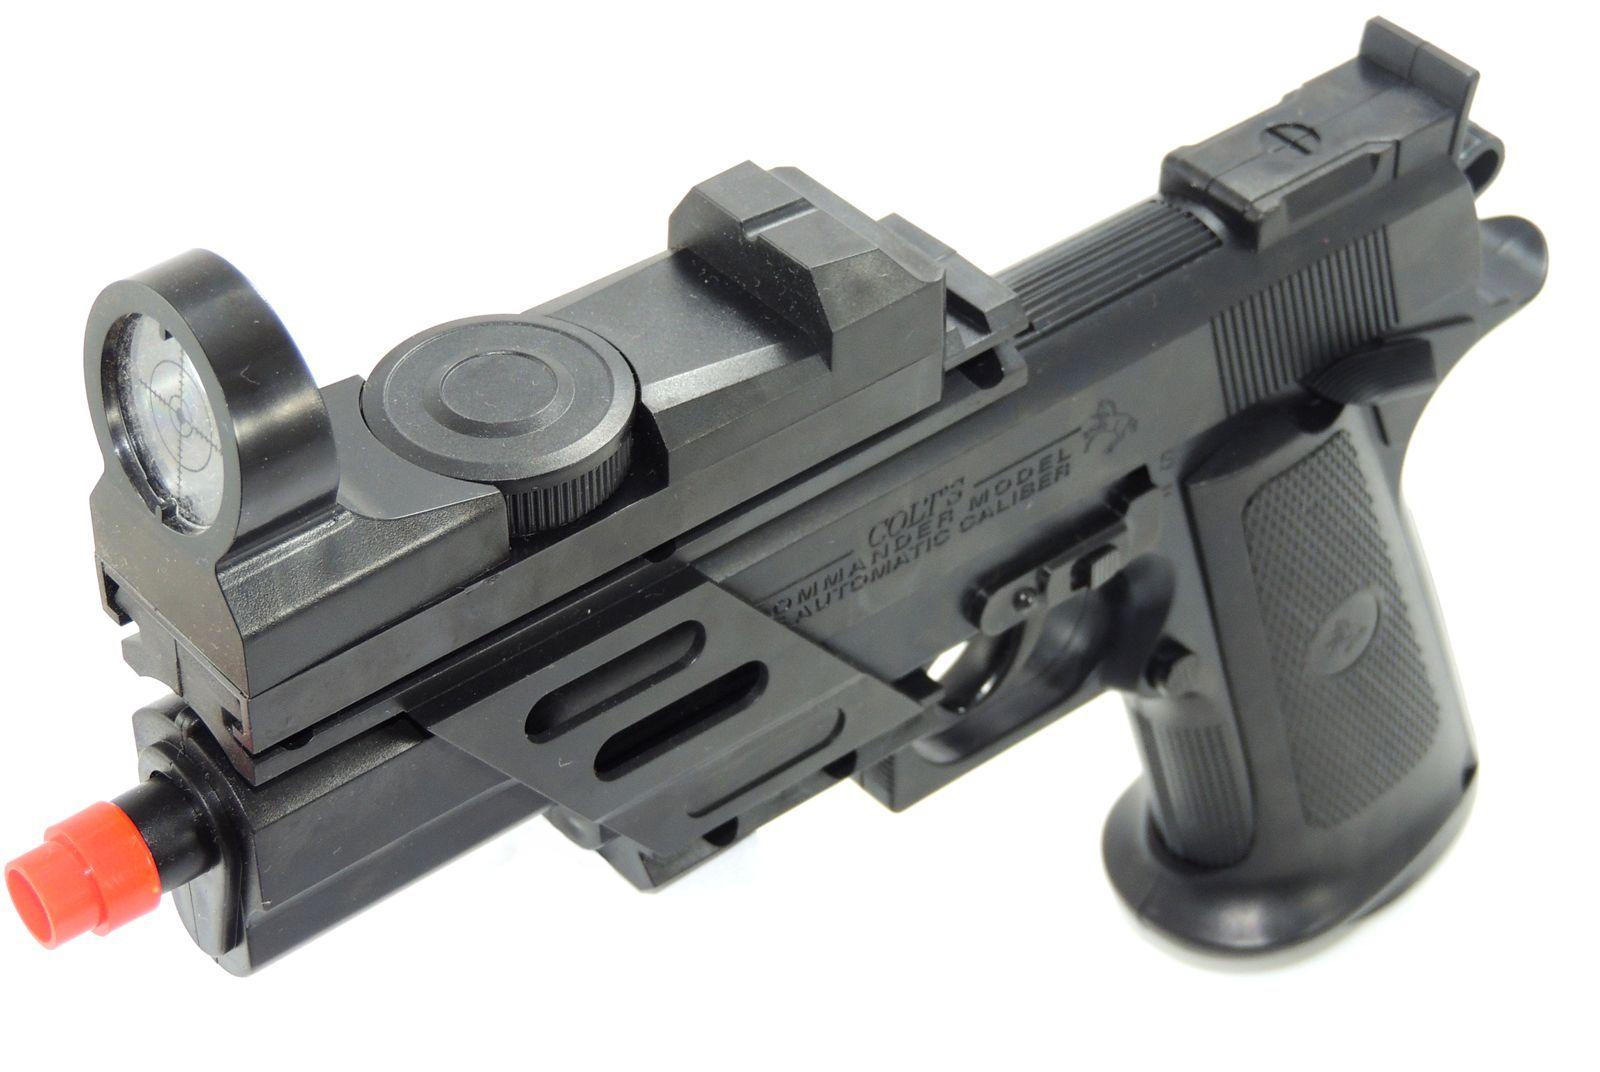 Pistola Airsoft Colt 1911 Combat Commander